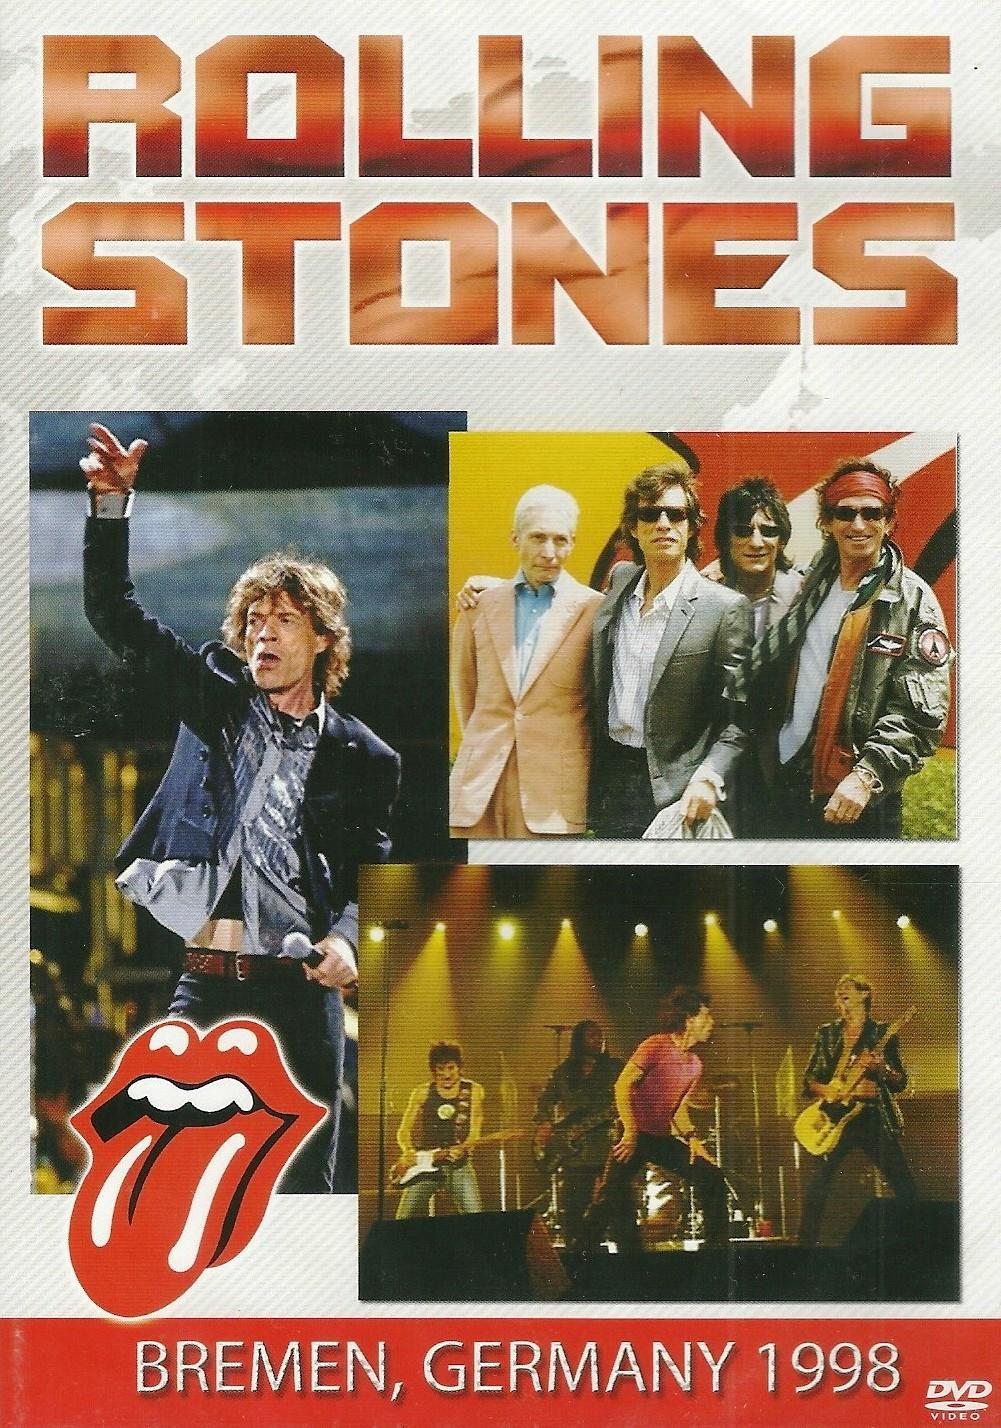 Rolling Stones - Bremen, Germany 1998 - DVD